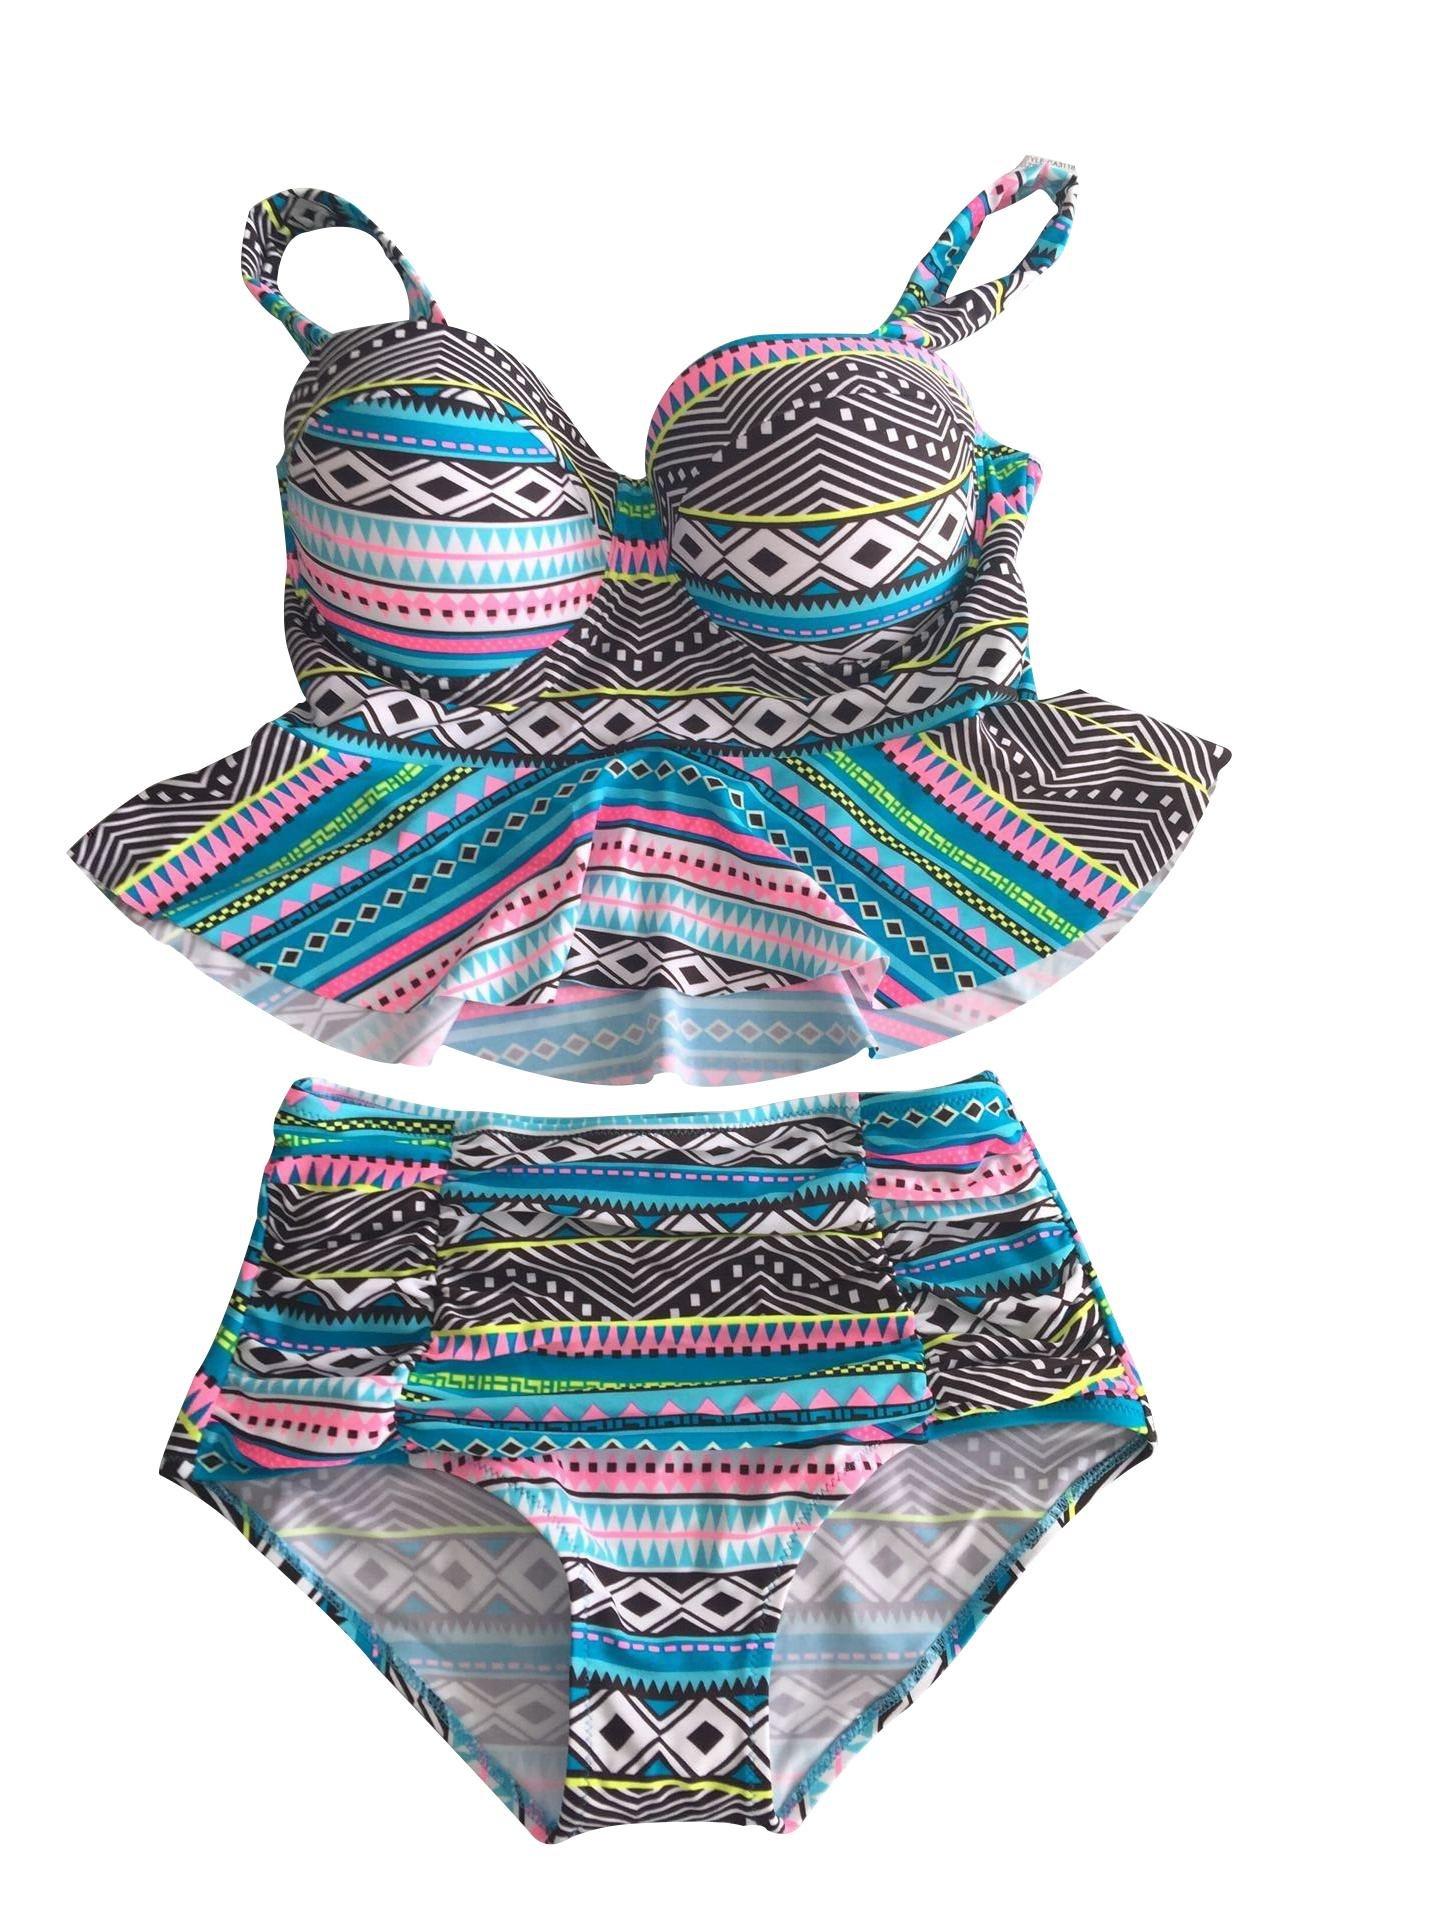 Ruffle Falbala Peplum Push up High Waist Bikini Set Tribal Swimsuit-KJ5577-BET5